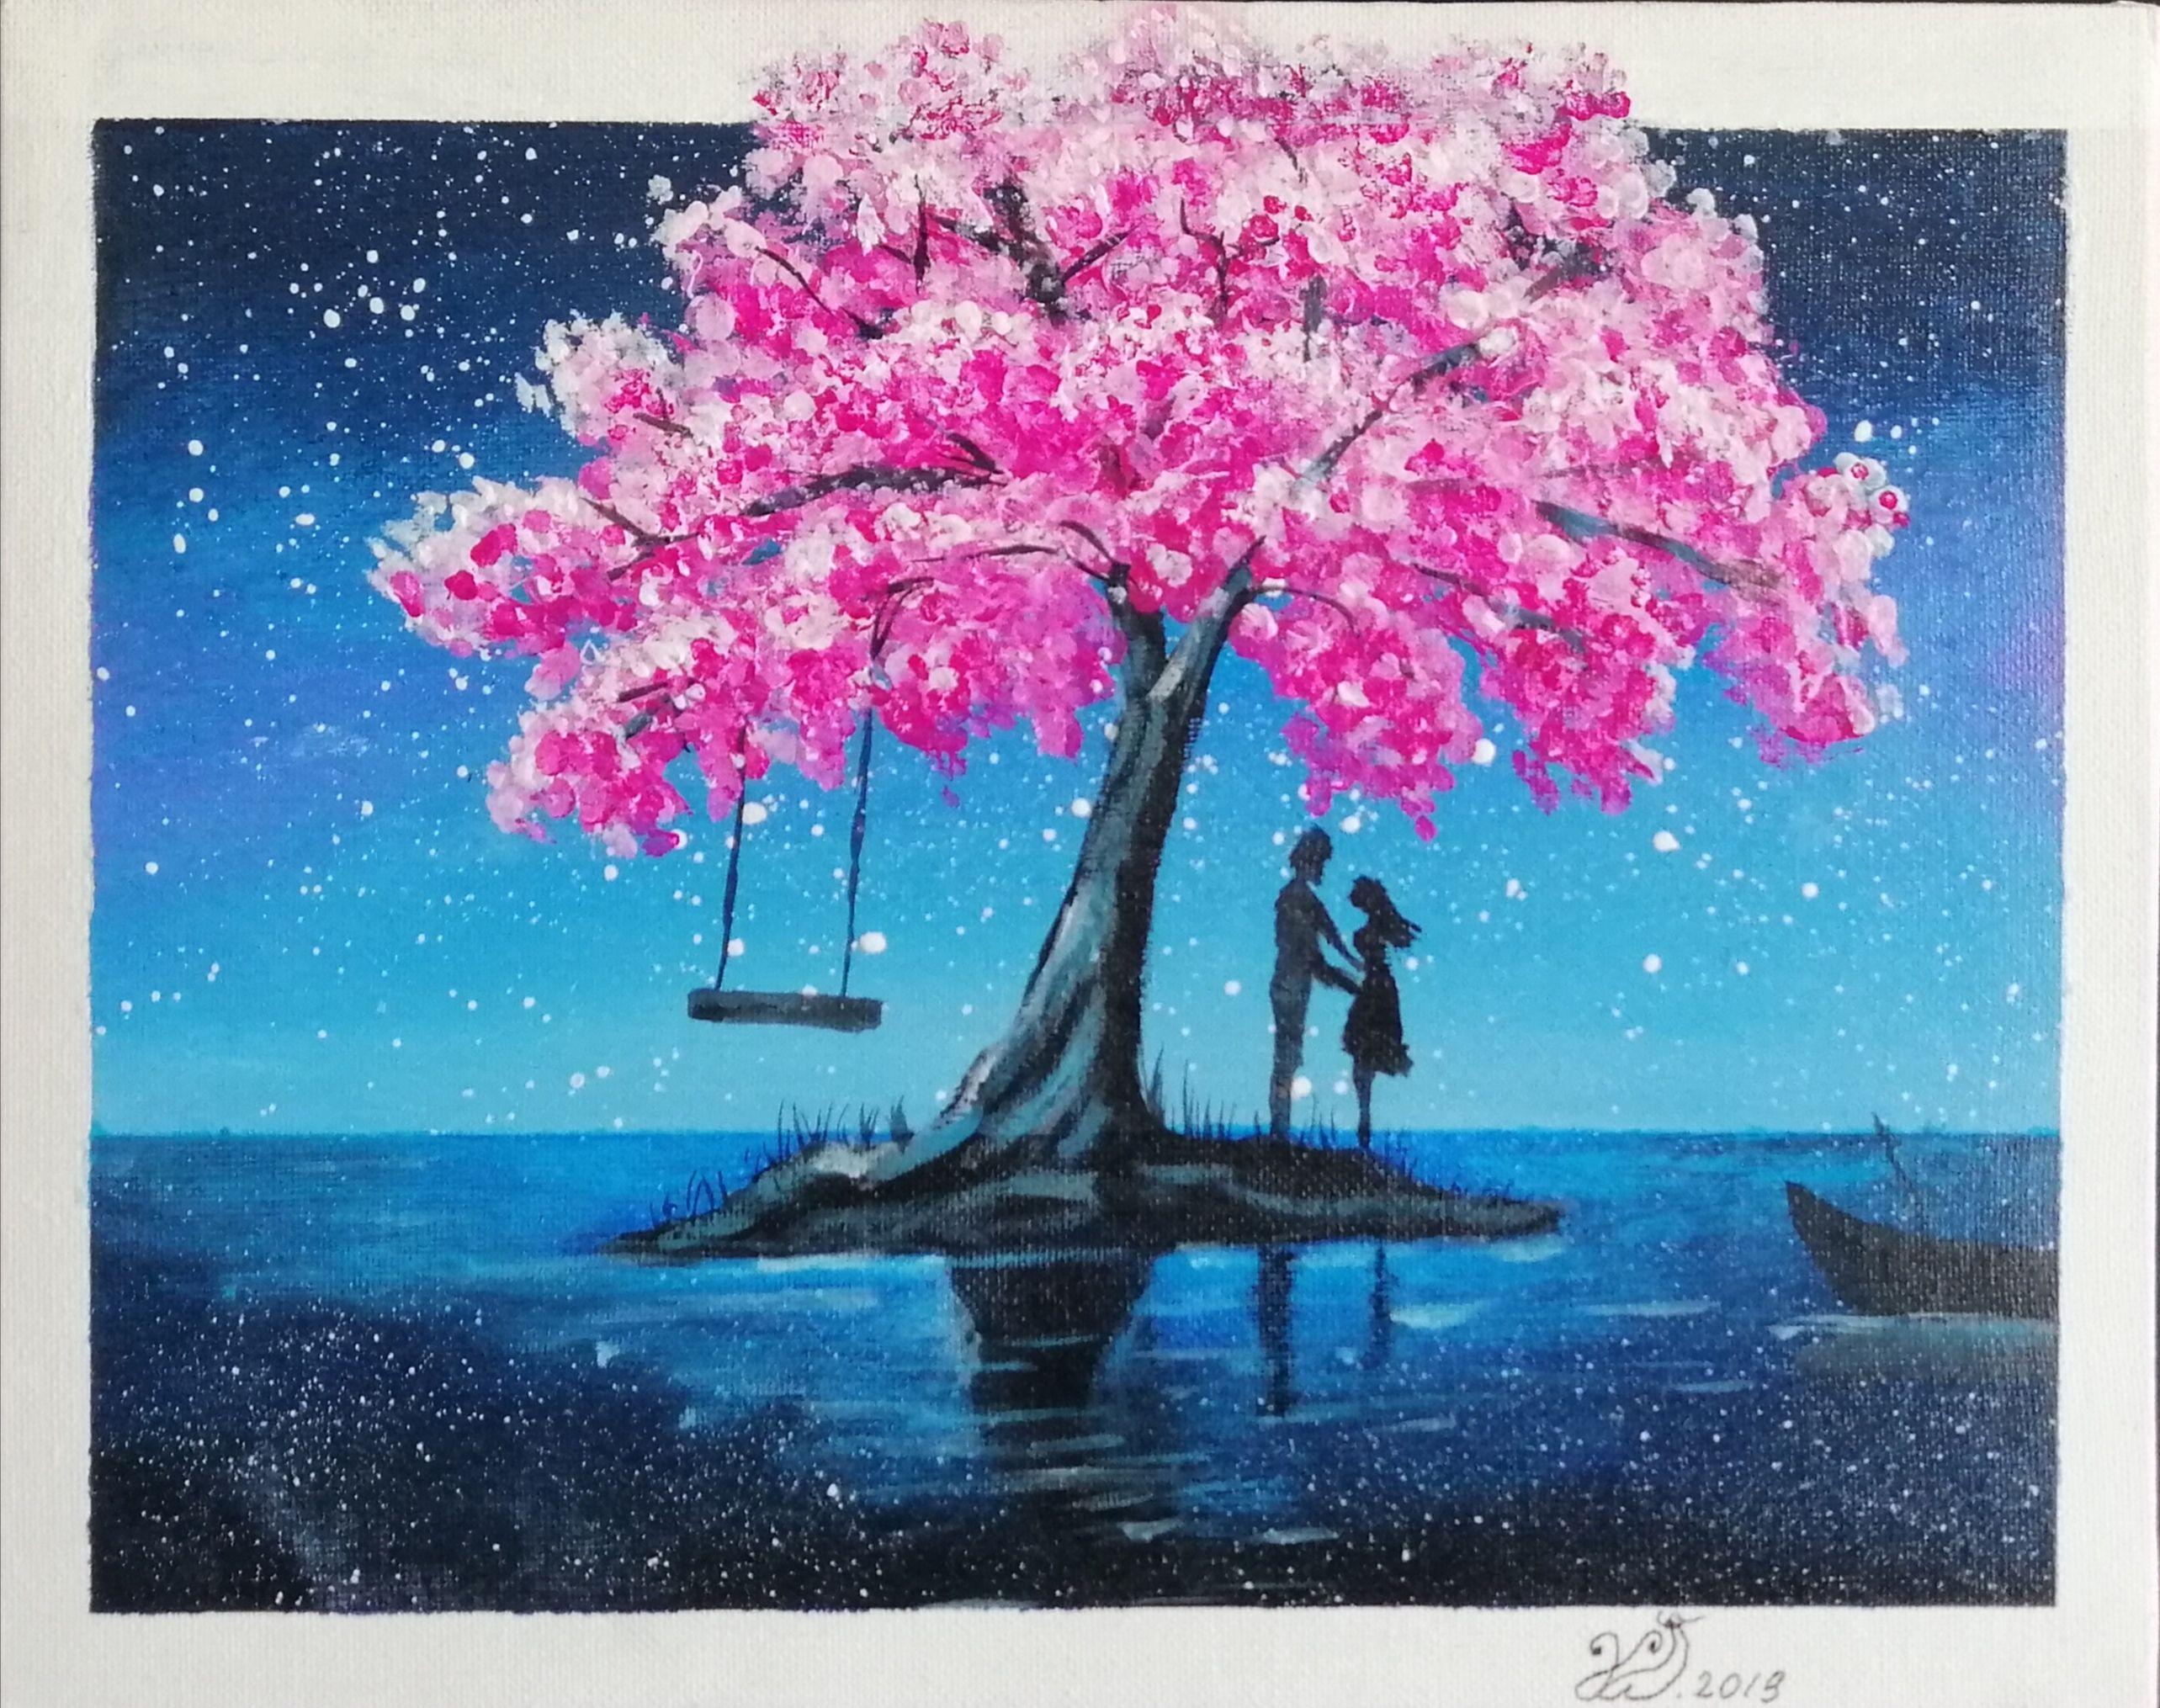 Kirschbaum Cherry Blossom Painting Art Drawing Scenery